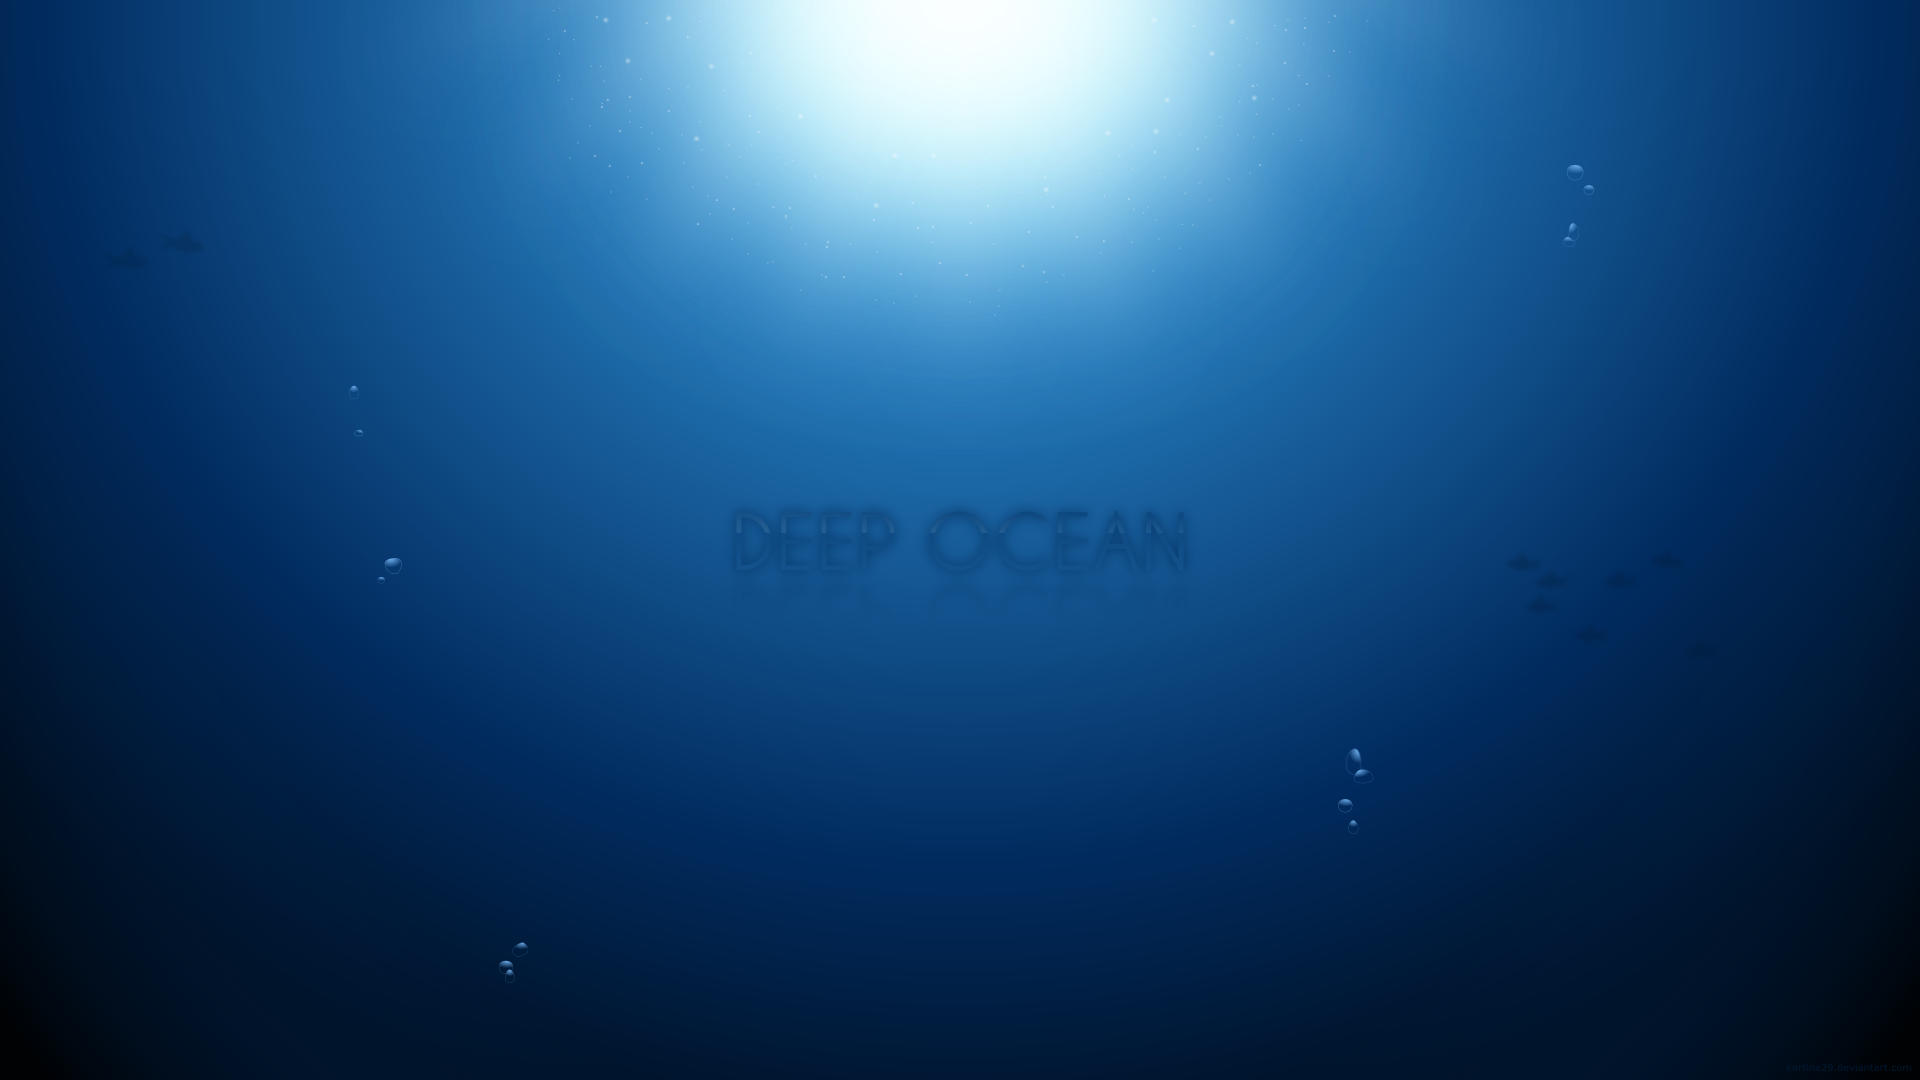 Deep Ocean Full HD by kartine29 1920x1080